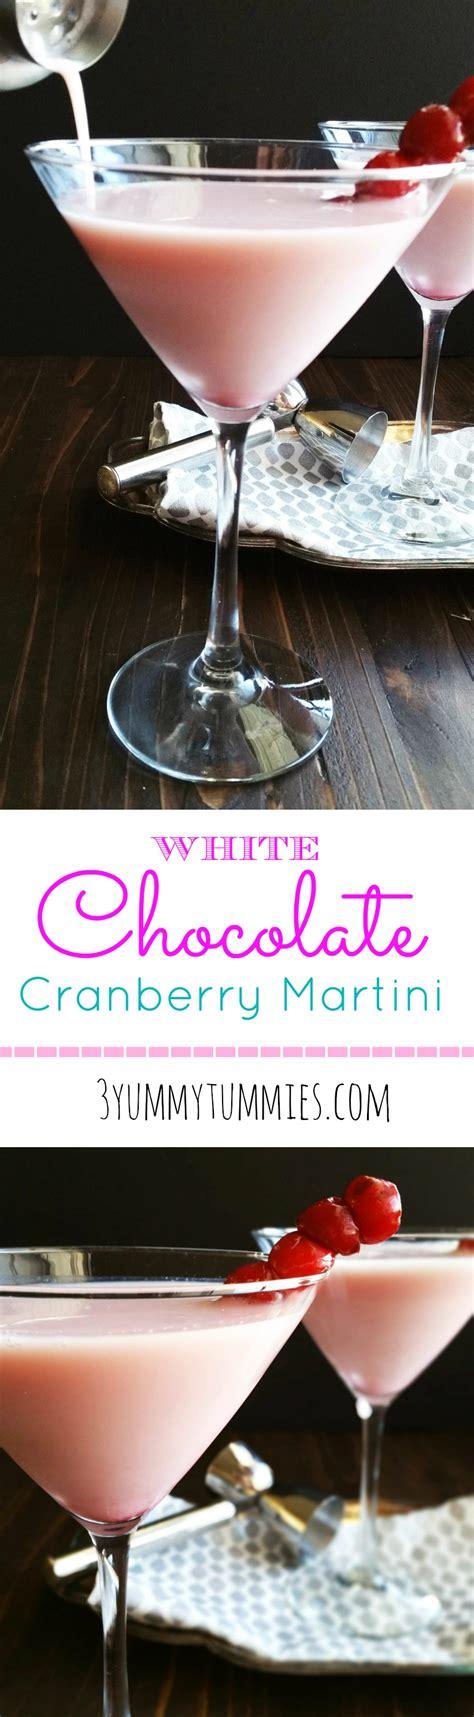 martini cranberry white chocolate cranberry pink martinis 3 yummy tummies